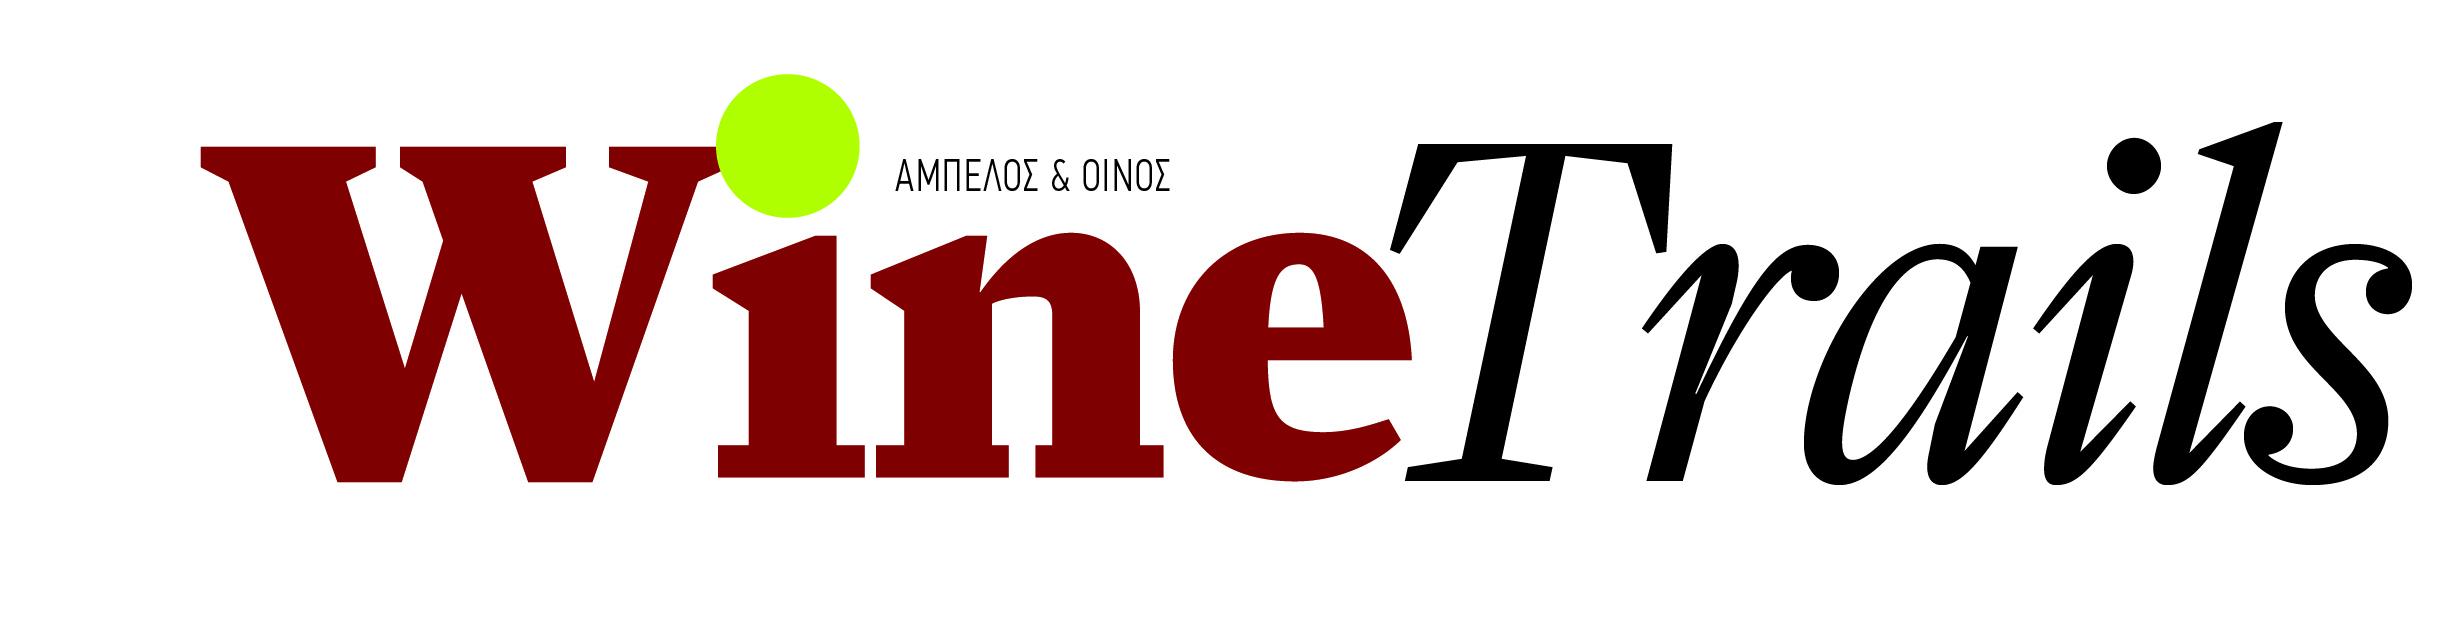 winetrails_logo1.jpg